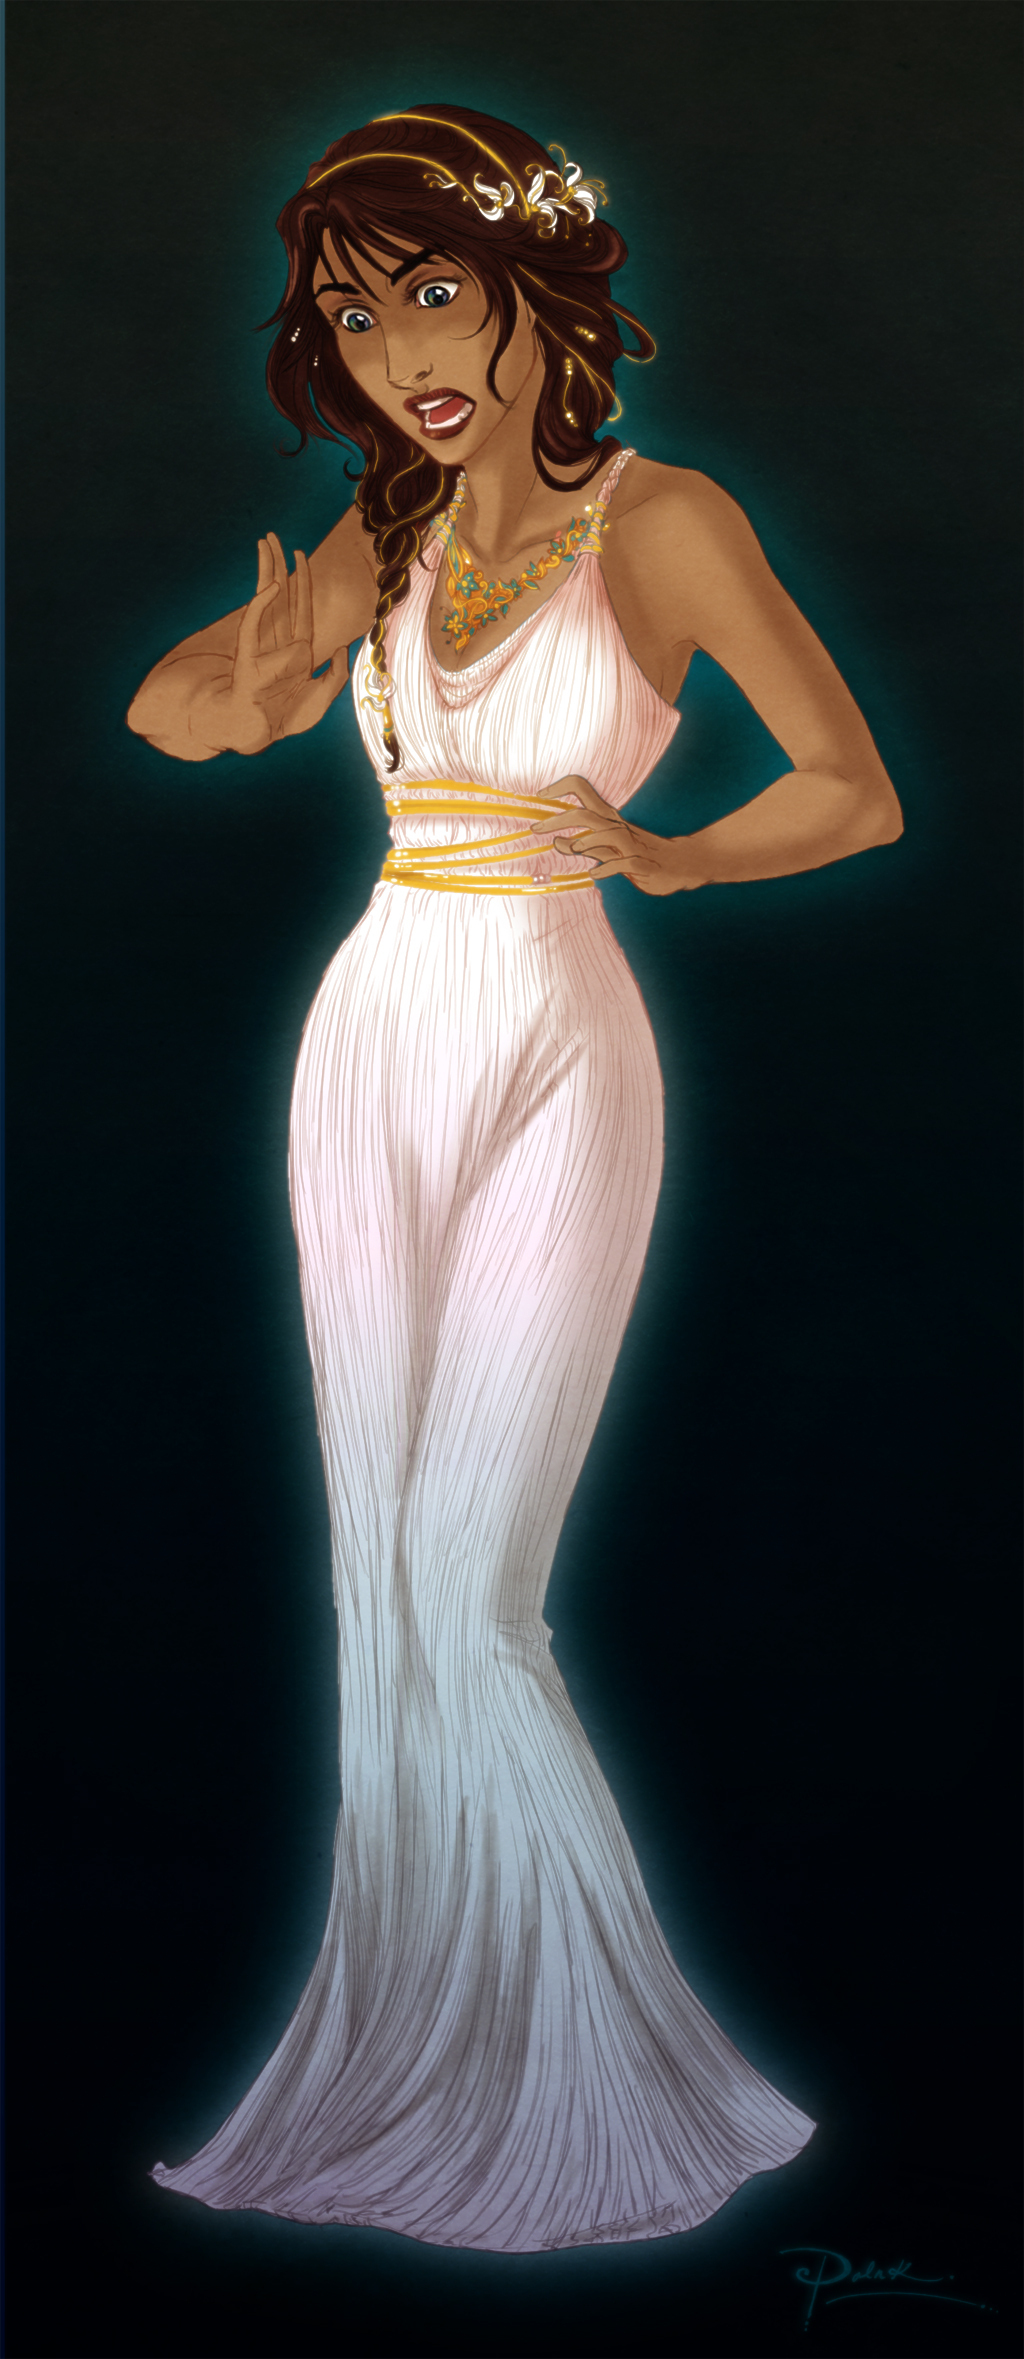 Aphrodite art and fashion Aphrodite art and fashion glamjulz